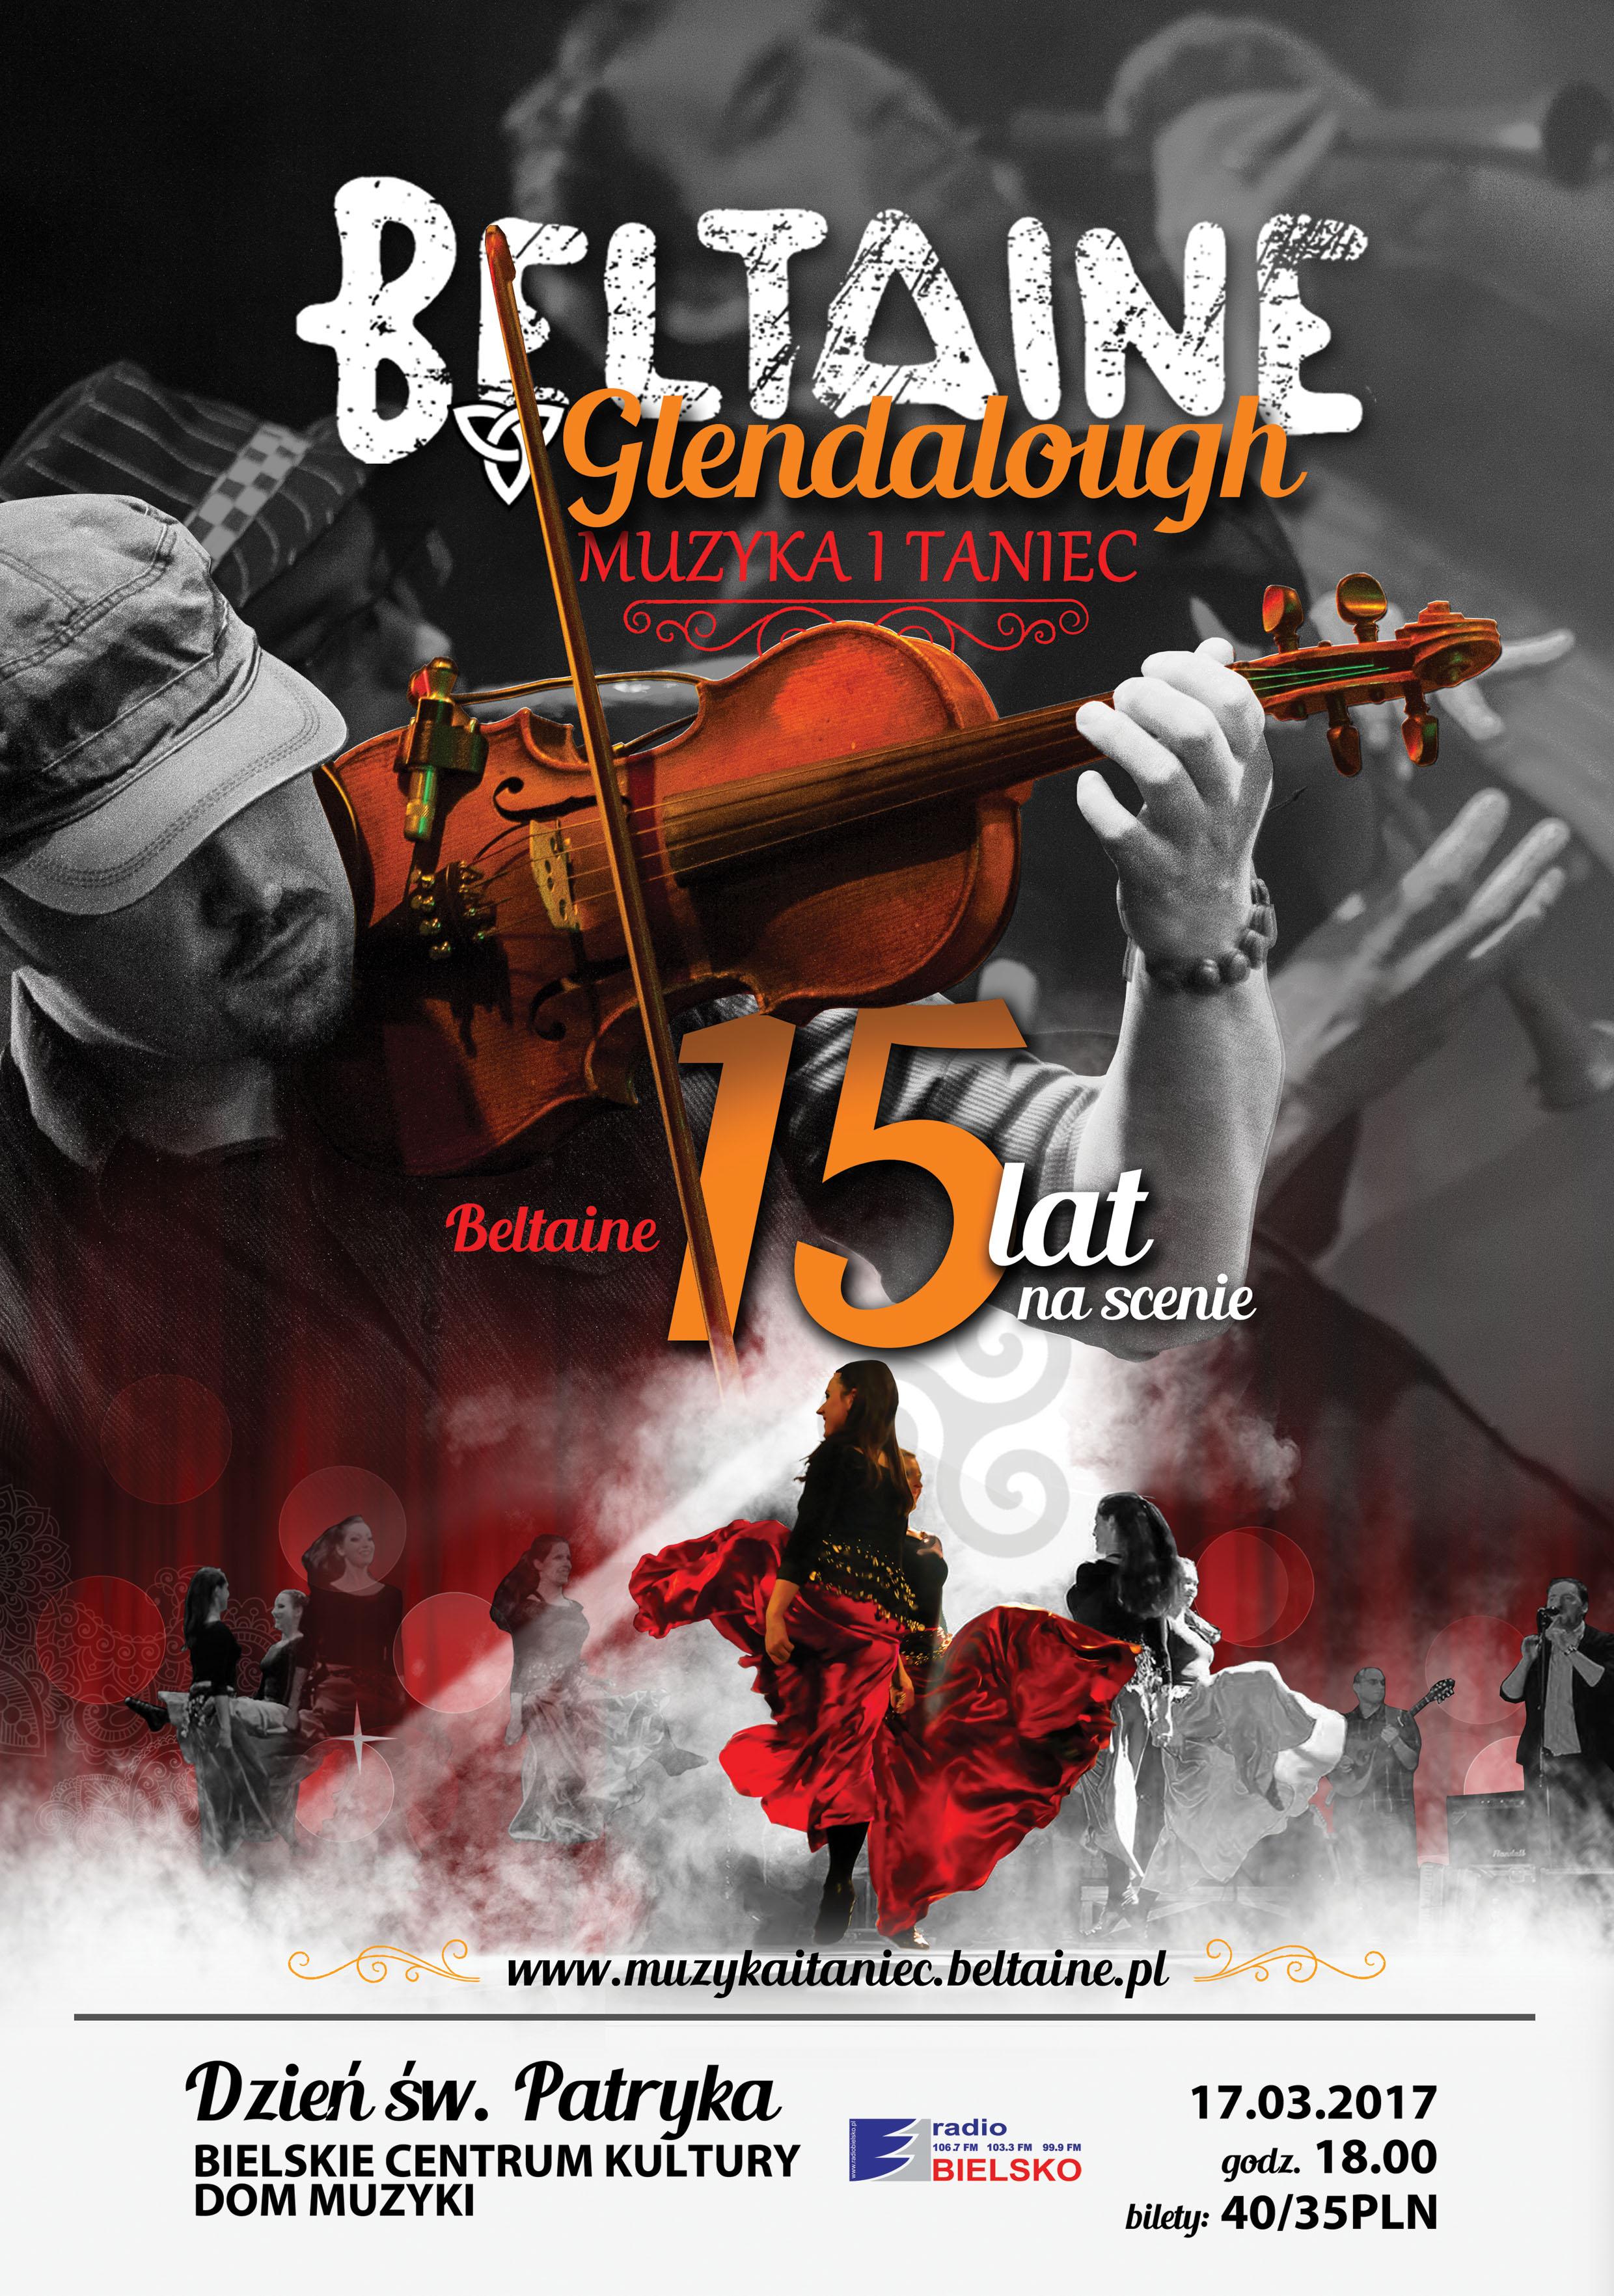 Beltaine-Glendalough, Muzyka I Taniec